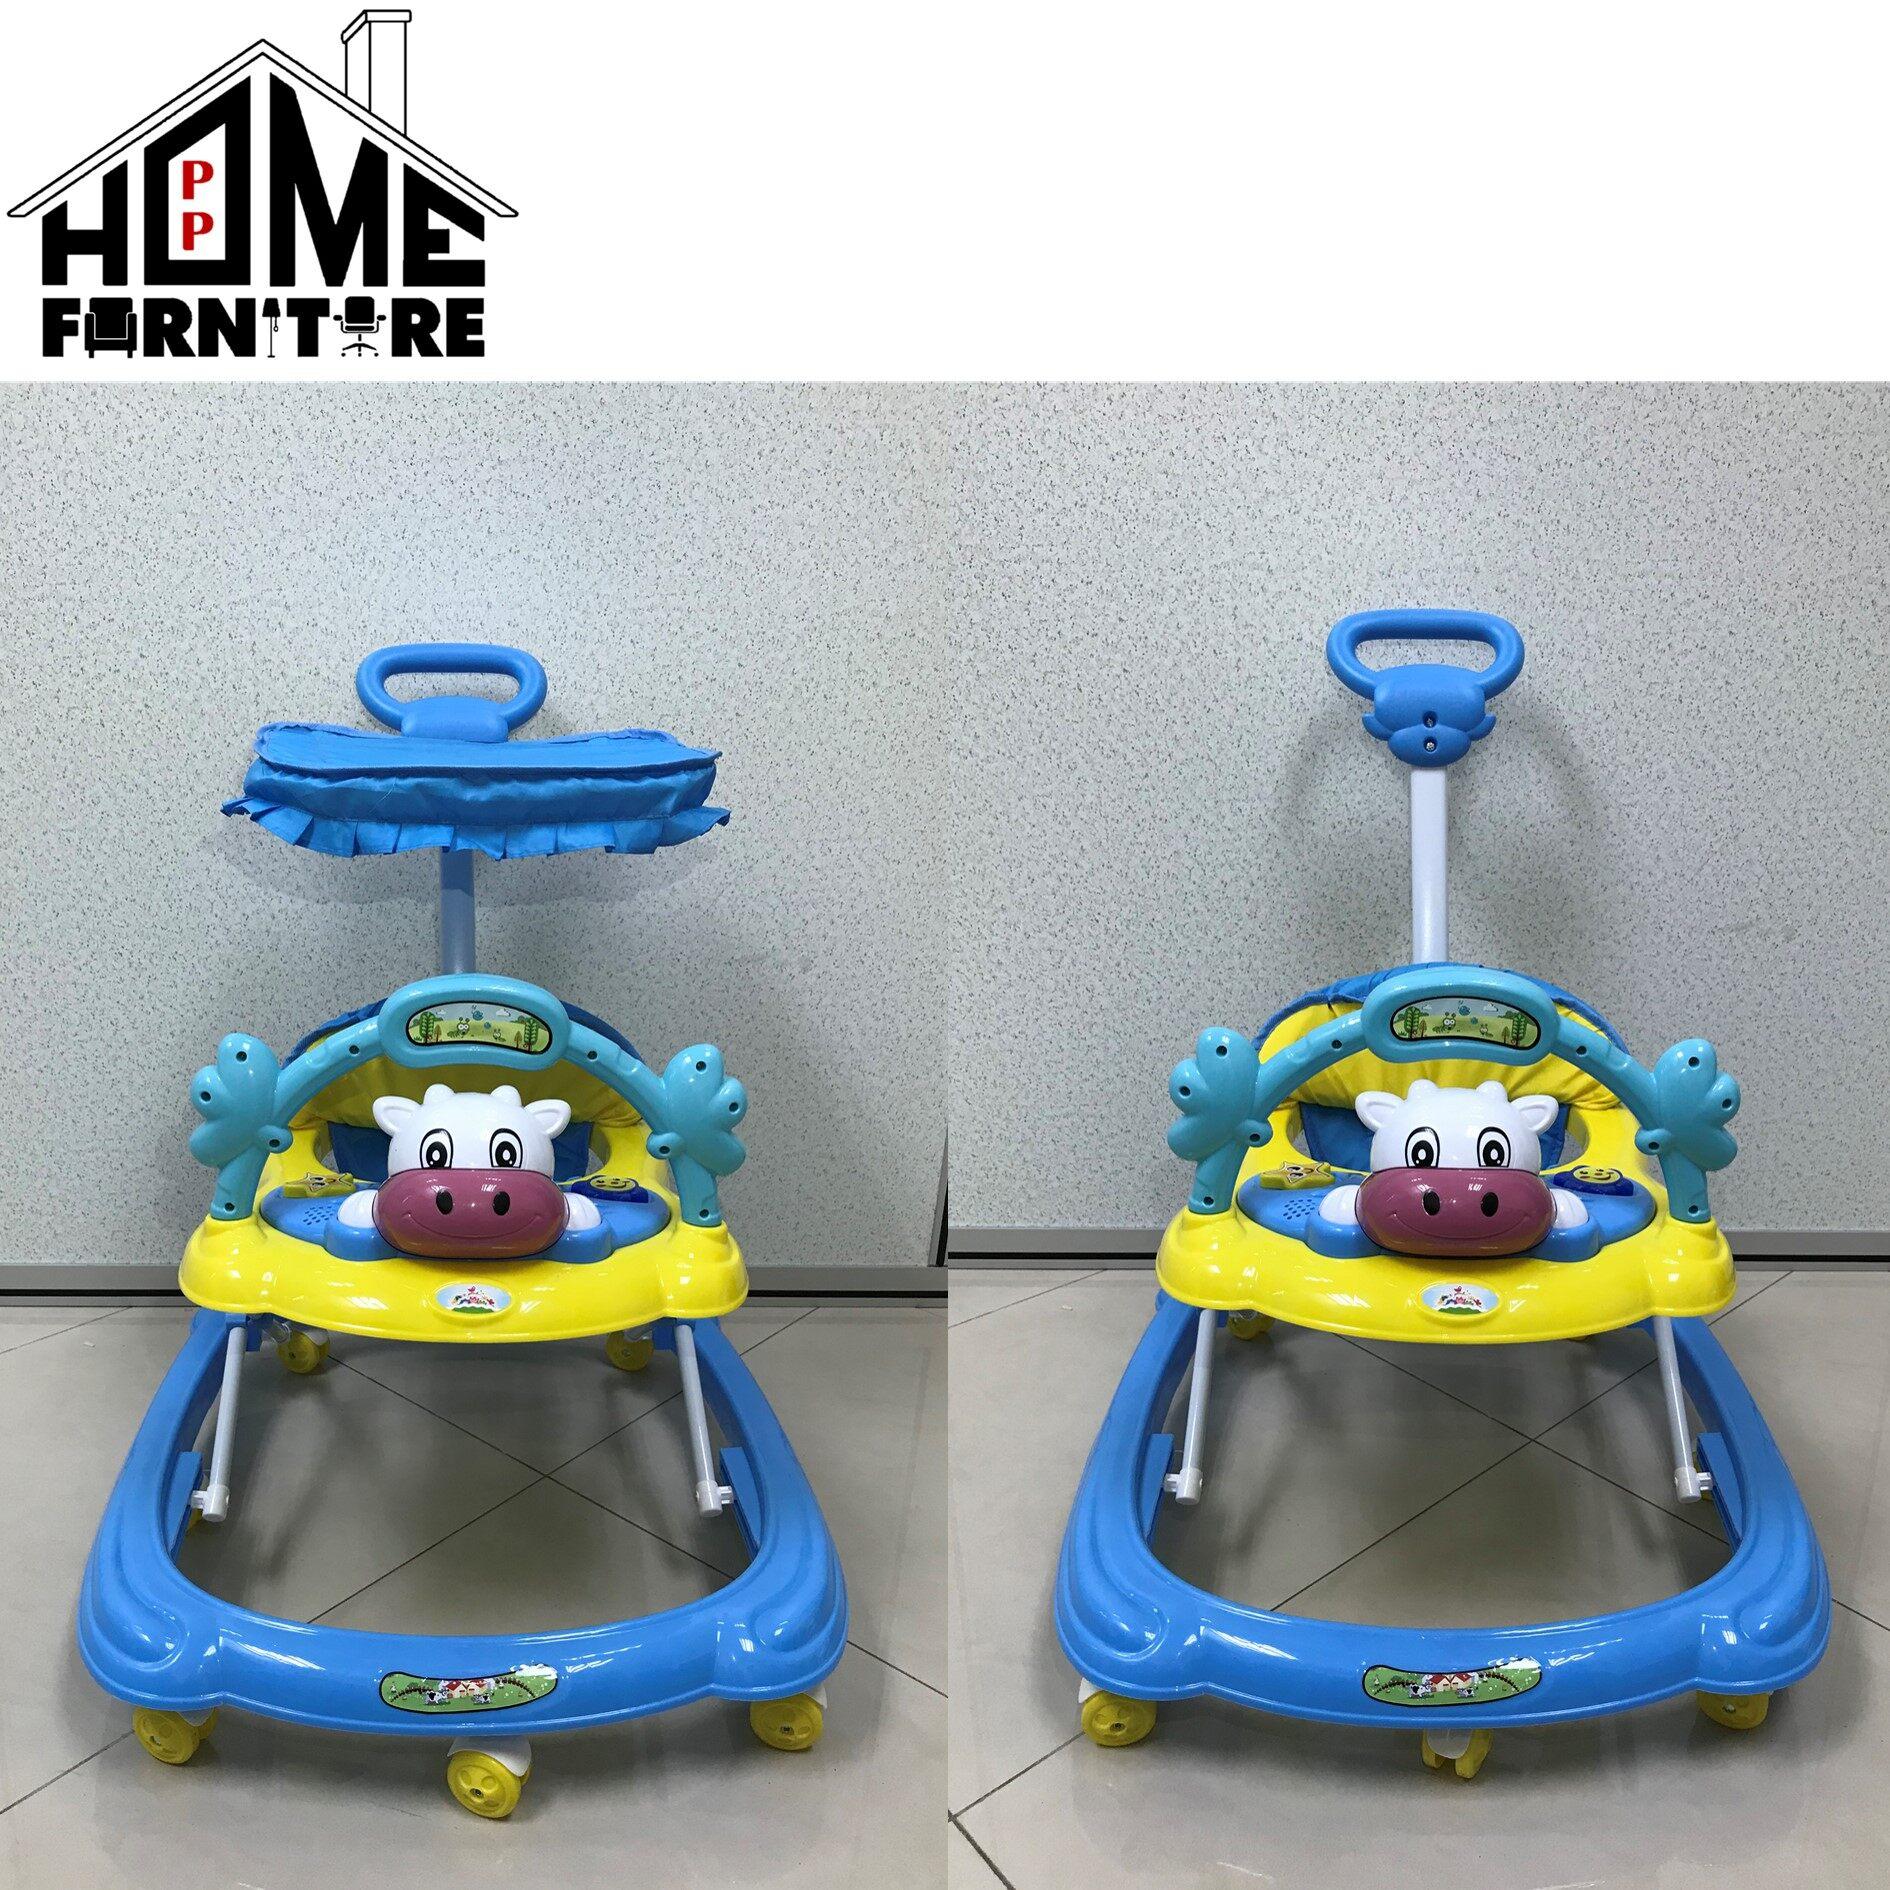 PP BABY Baby walker/ baby car/baby toddler car/ baby walk roller/Kereta bayi/ 婴儿车/婴儿滚轮 WITH Music PP HOME Kids furniture/Infant play toys/ Baby toys/ Mainan baby婴儿小孩玩具:9276